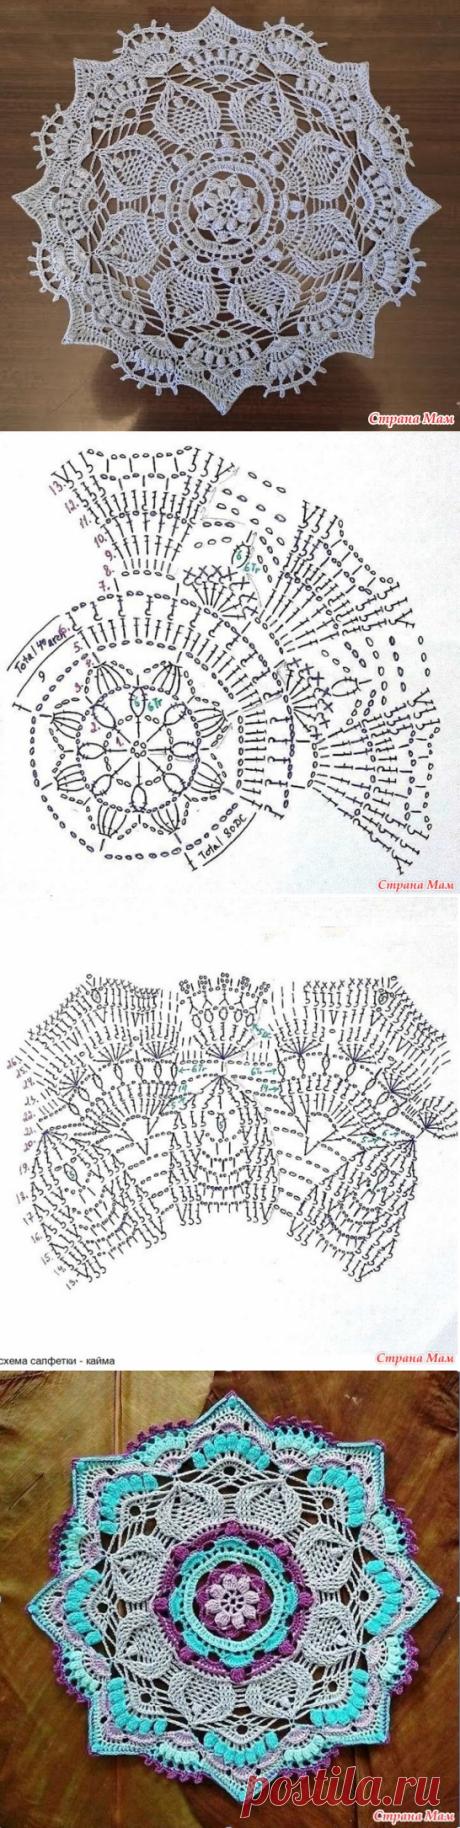 Круглая салфетка крючком - Вязание - Страна Мам